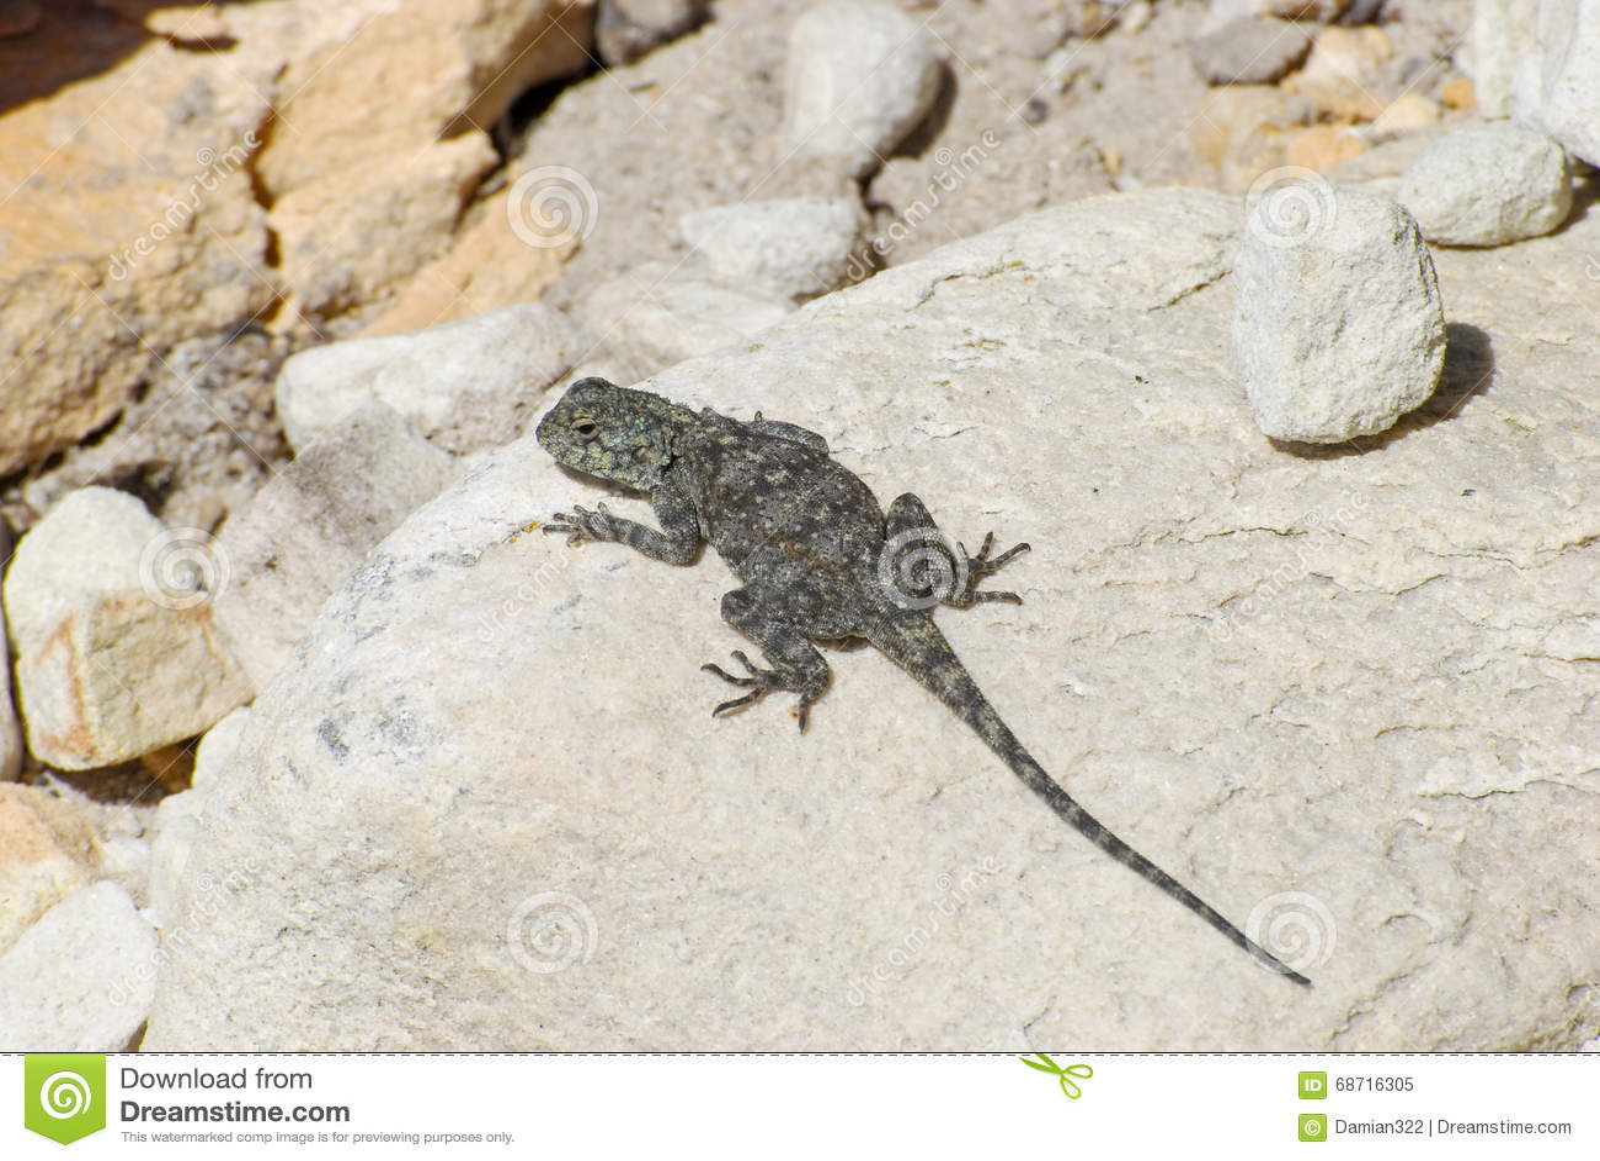 Lézard femelle d agame de roche (atra d agame)